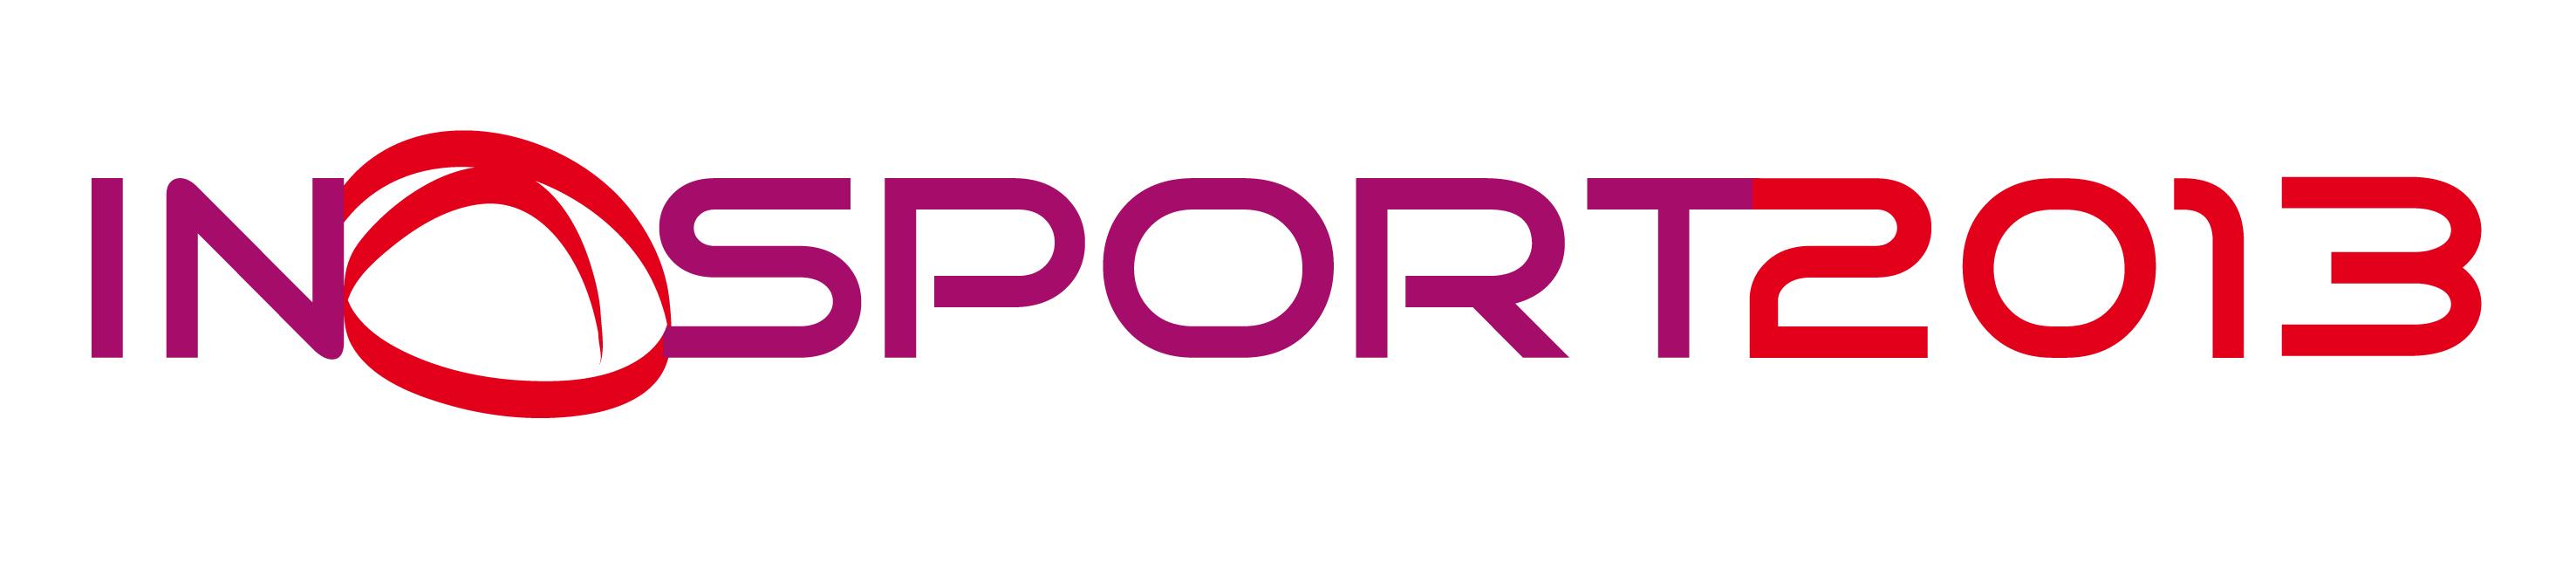 Logo INOSPORT 2013